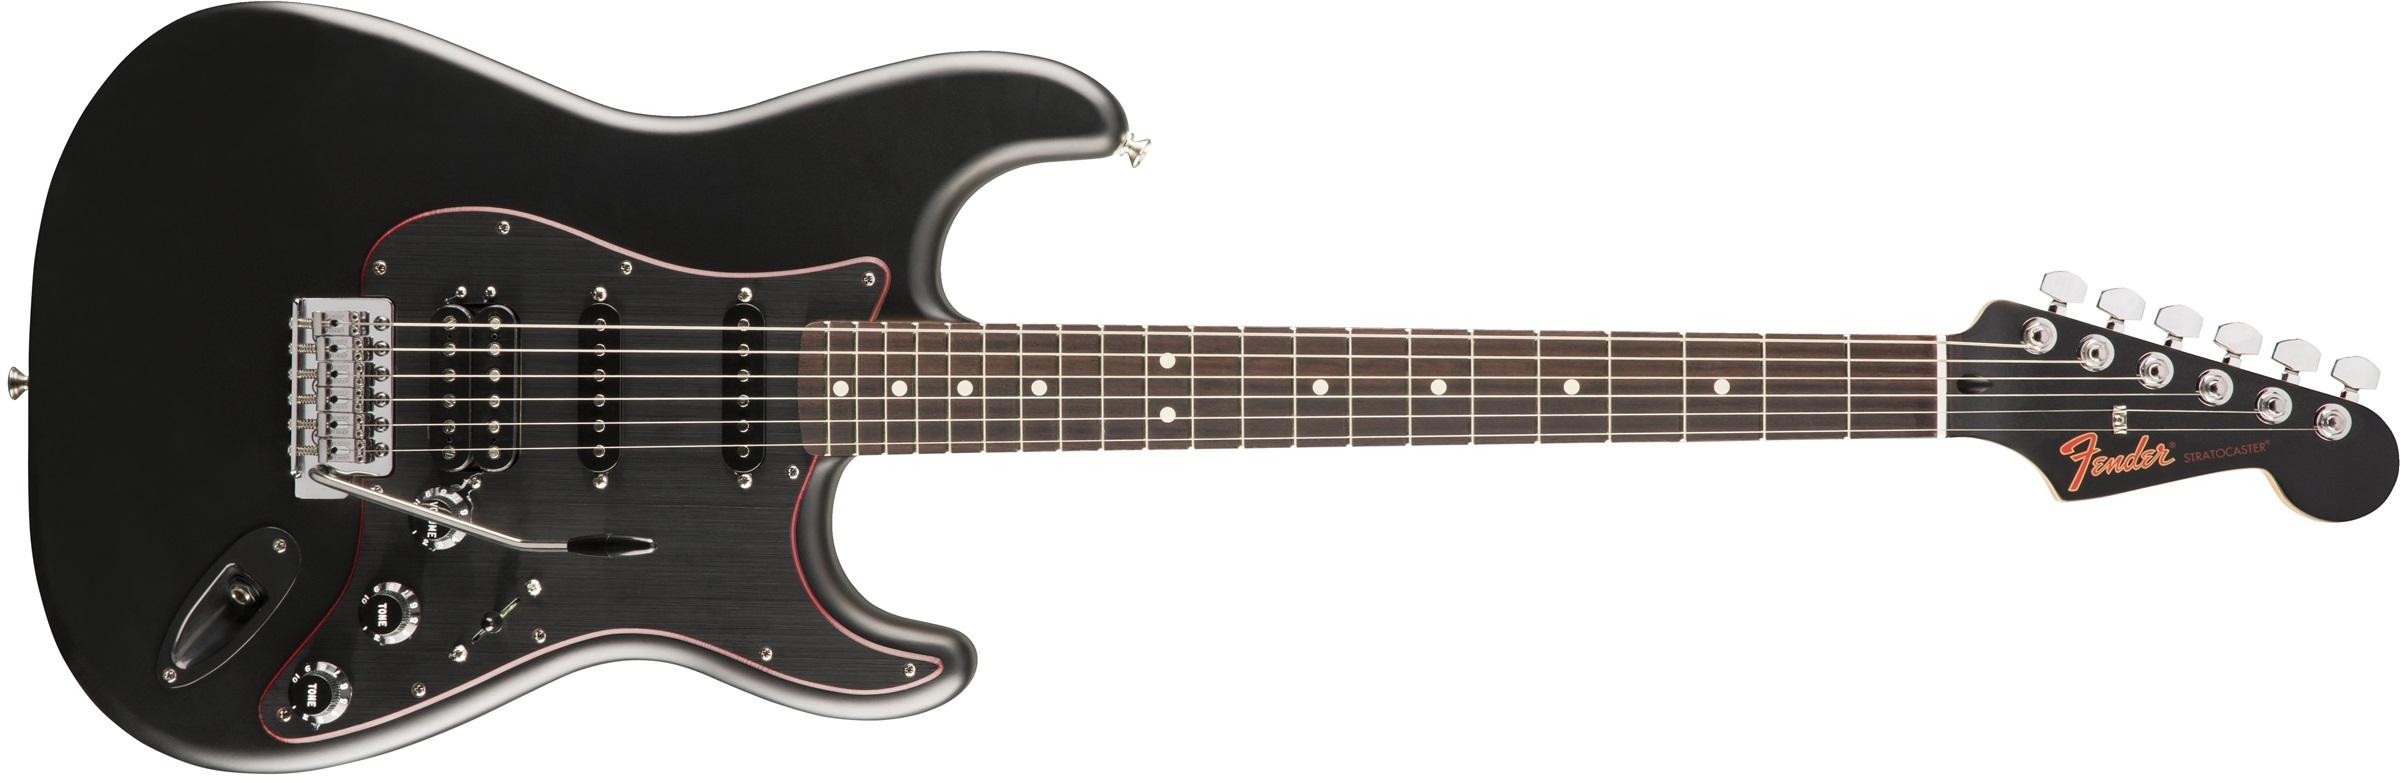 Fender Special Edition Noir Stratocaster